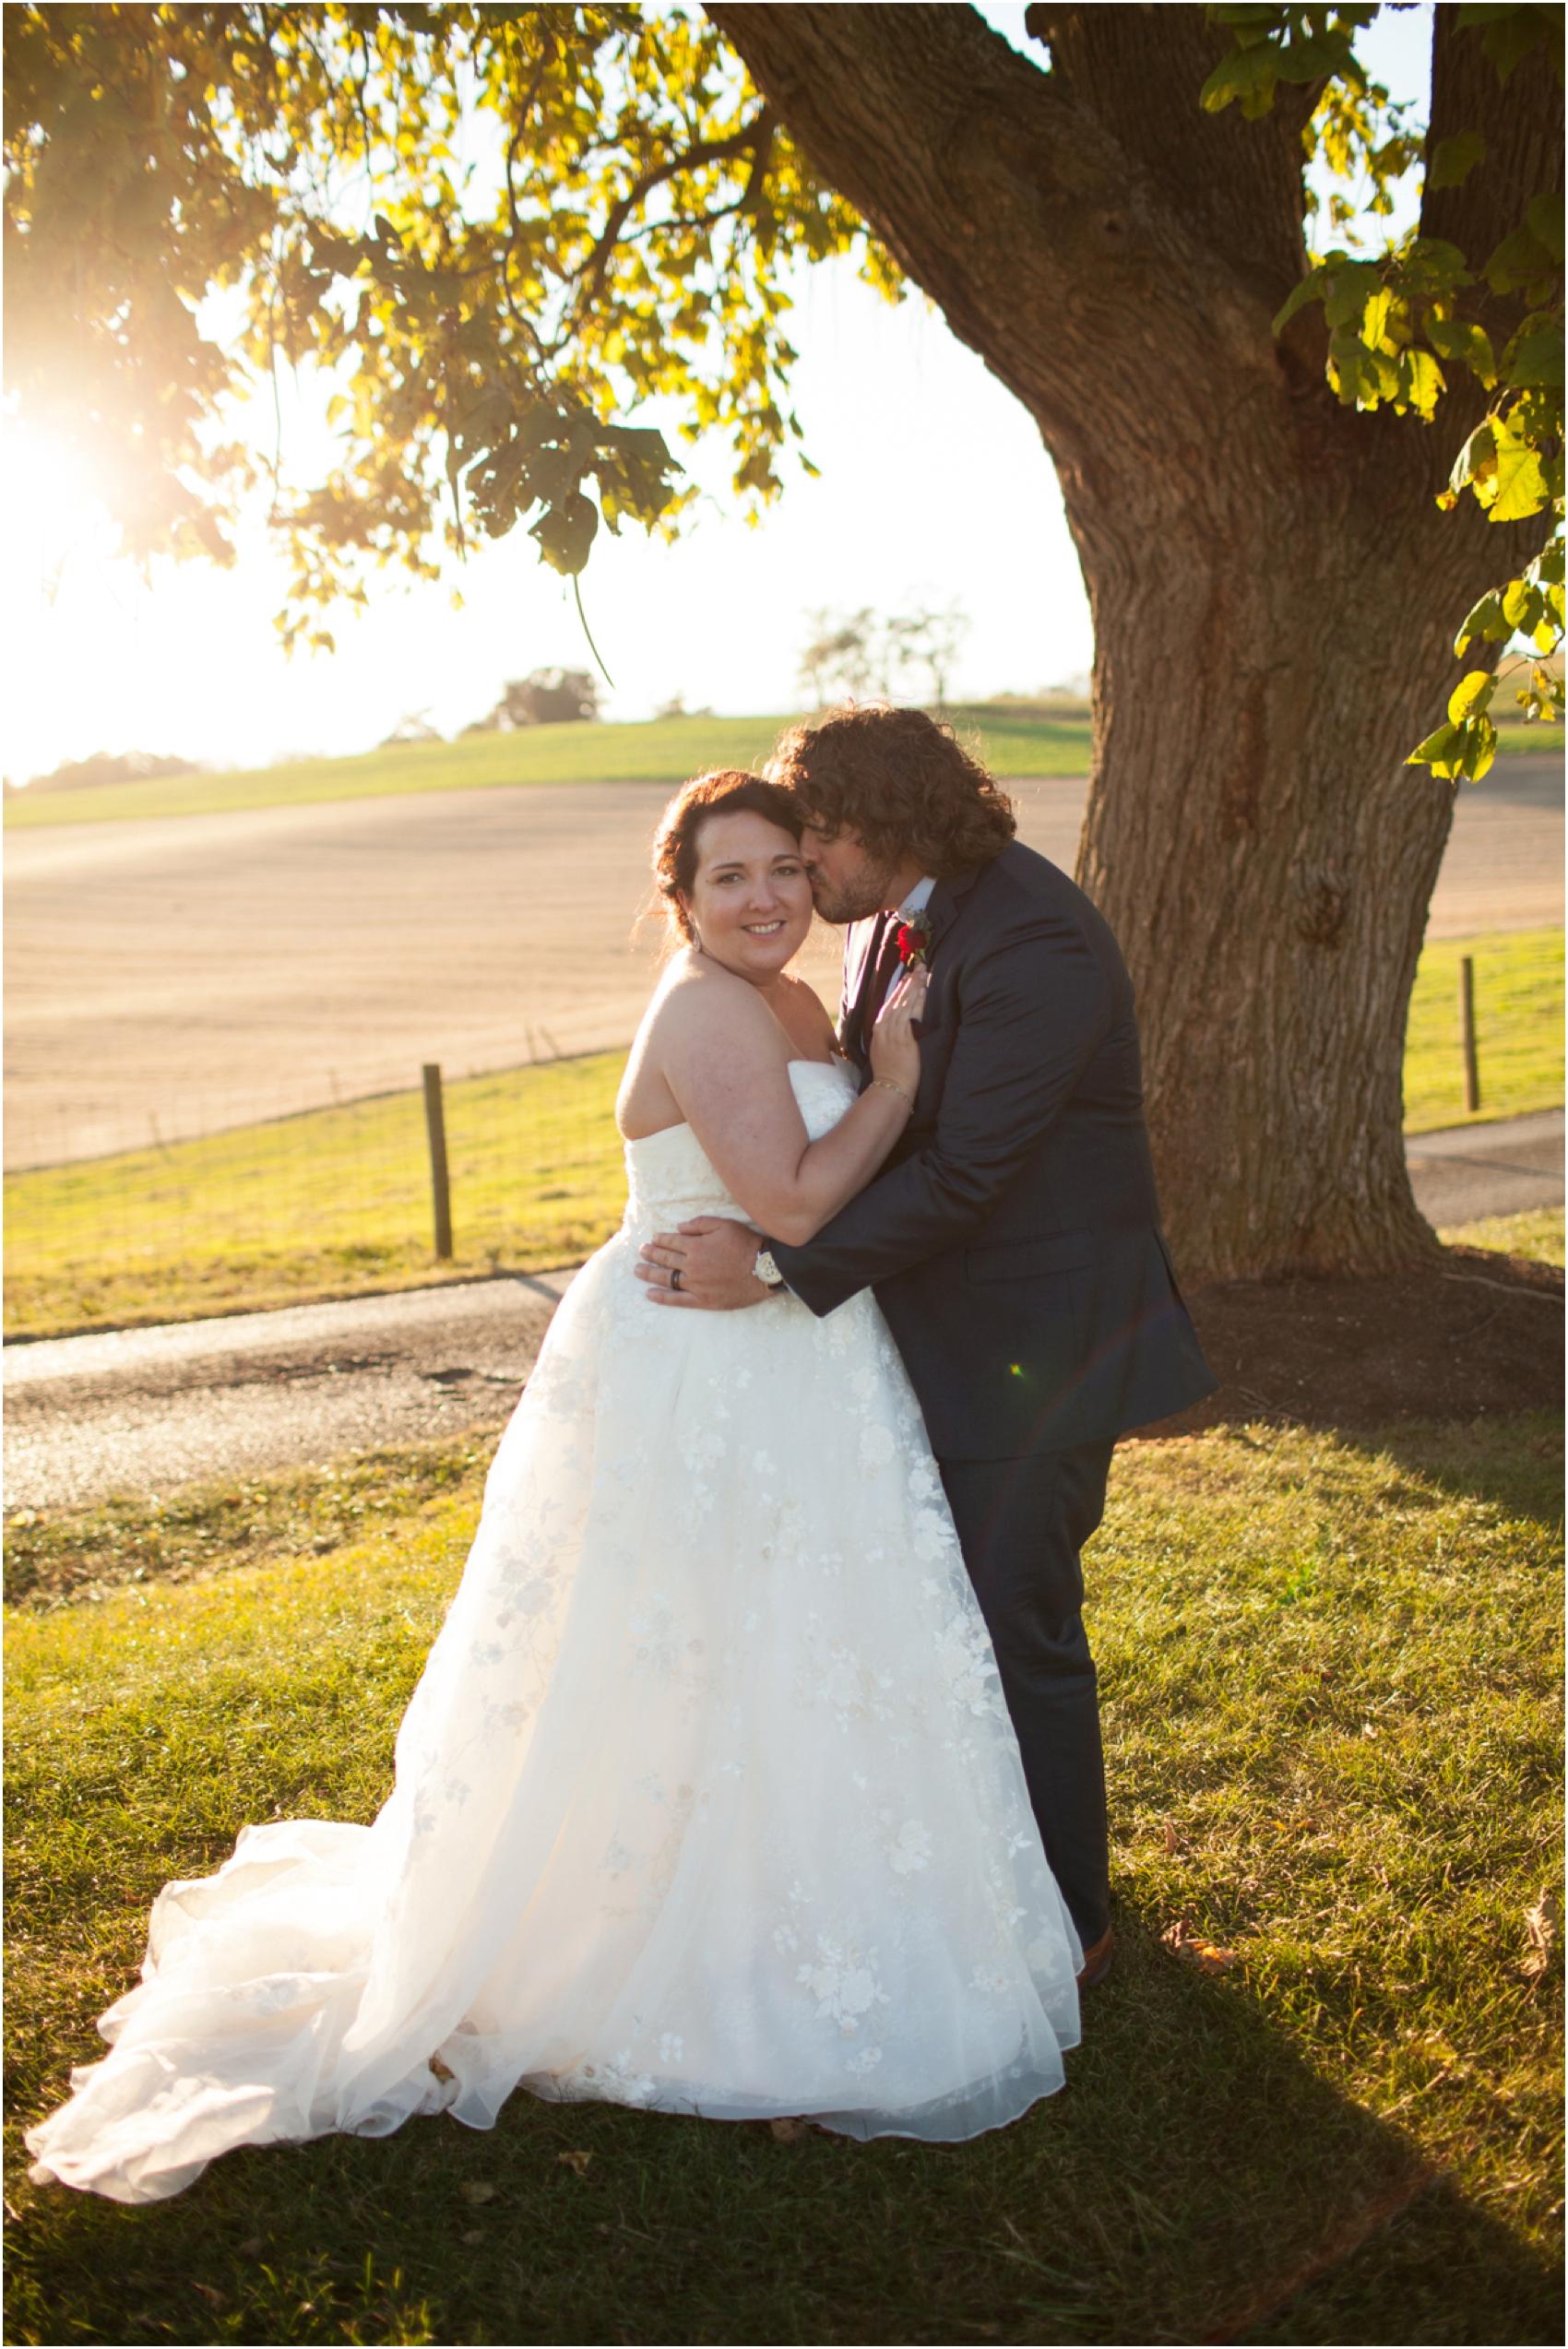 On-Sunny-Slope-Farm-Fall-Virginia-Wedding-3239.jpg